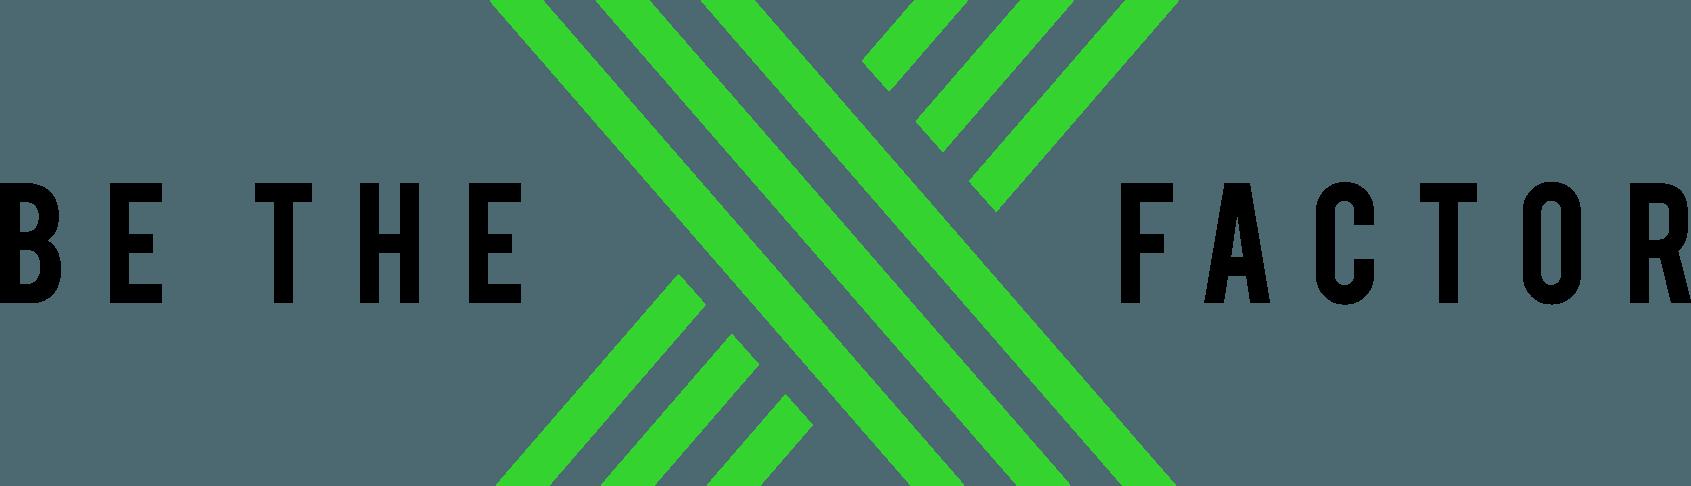 xfactorArtboard 2@2x-8.png